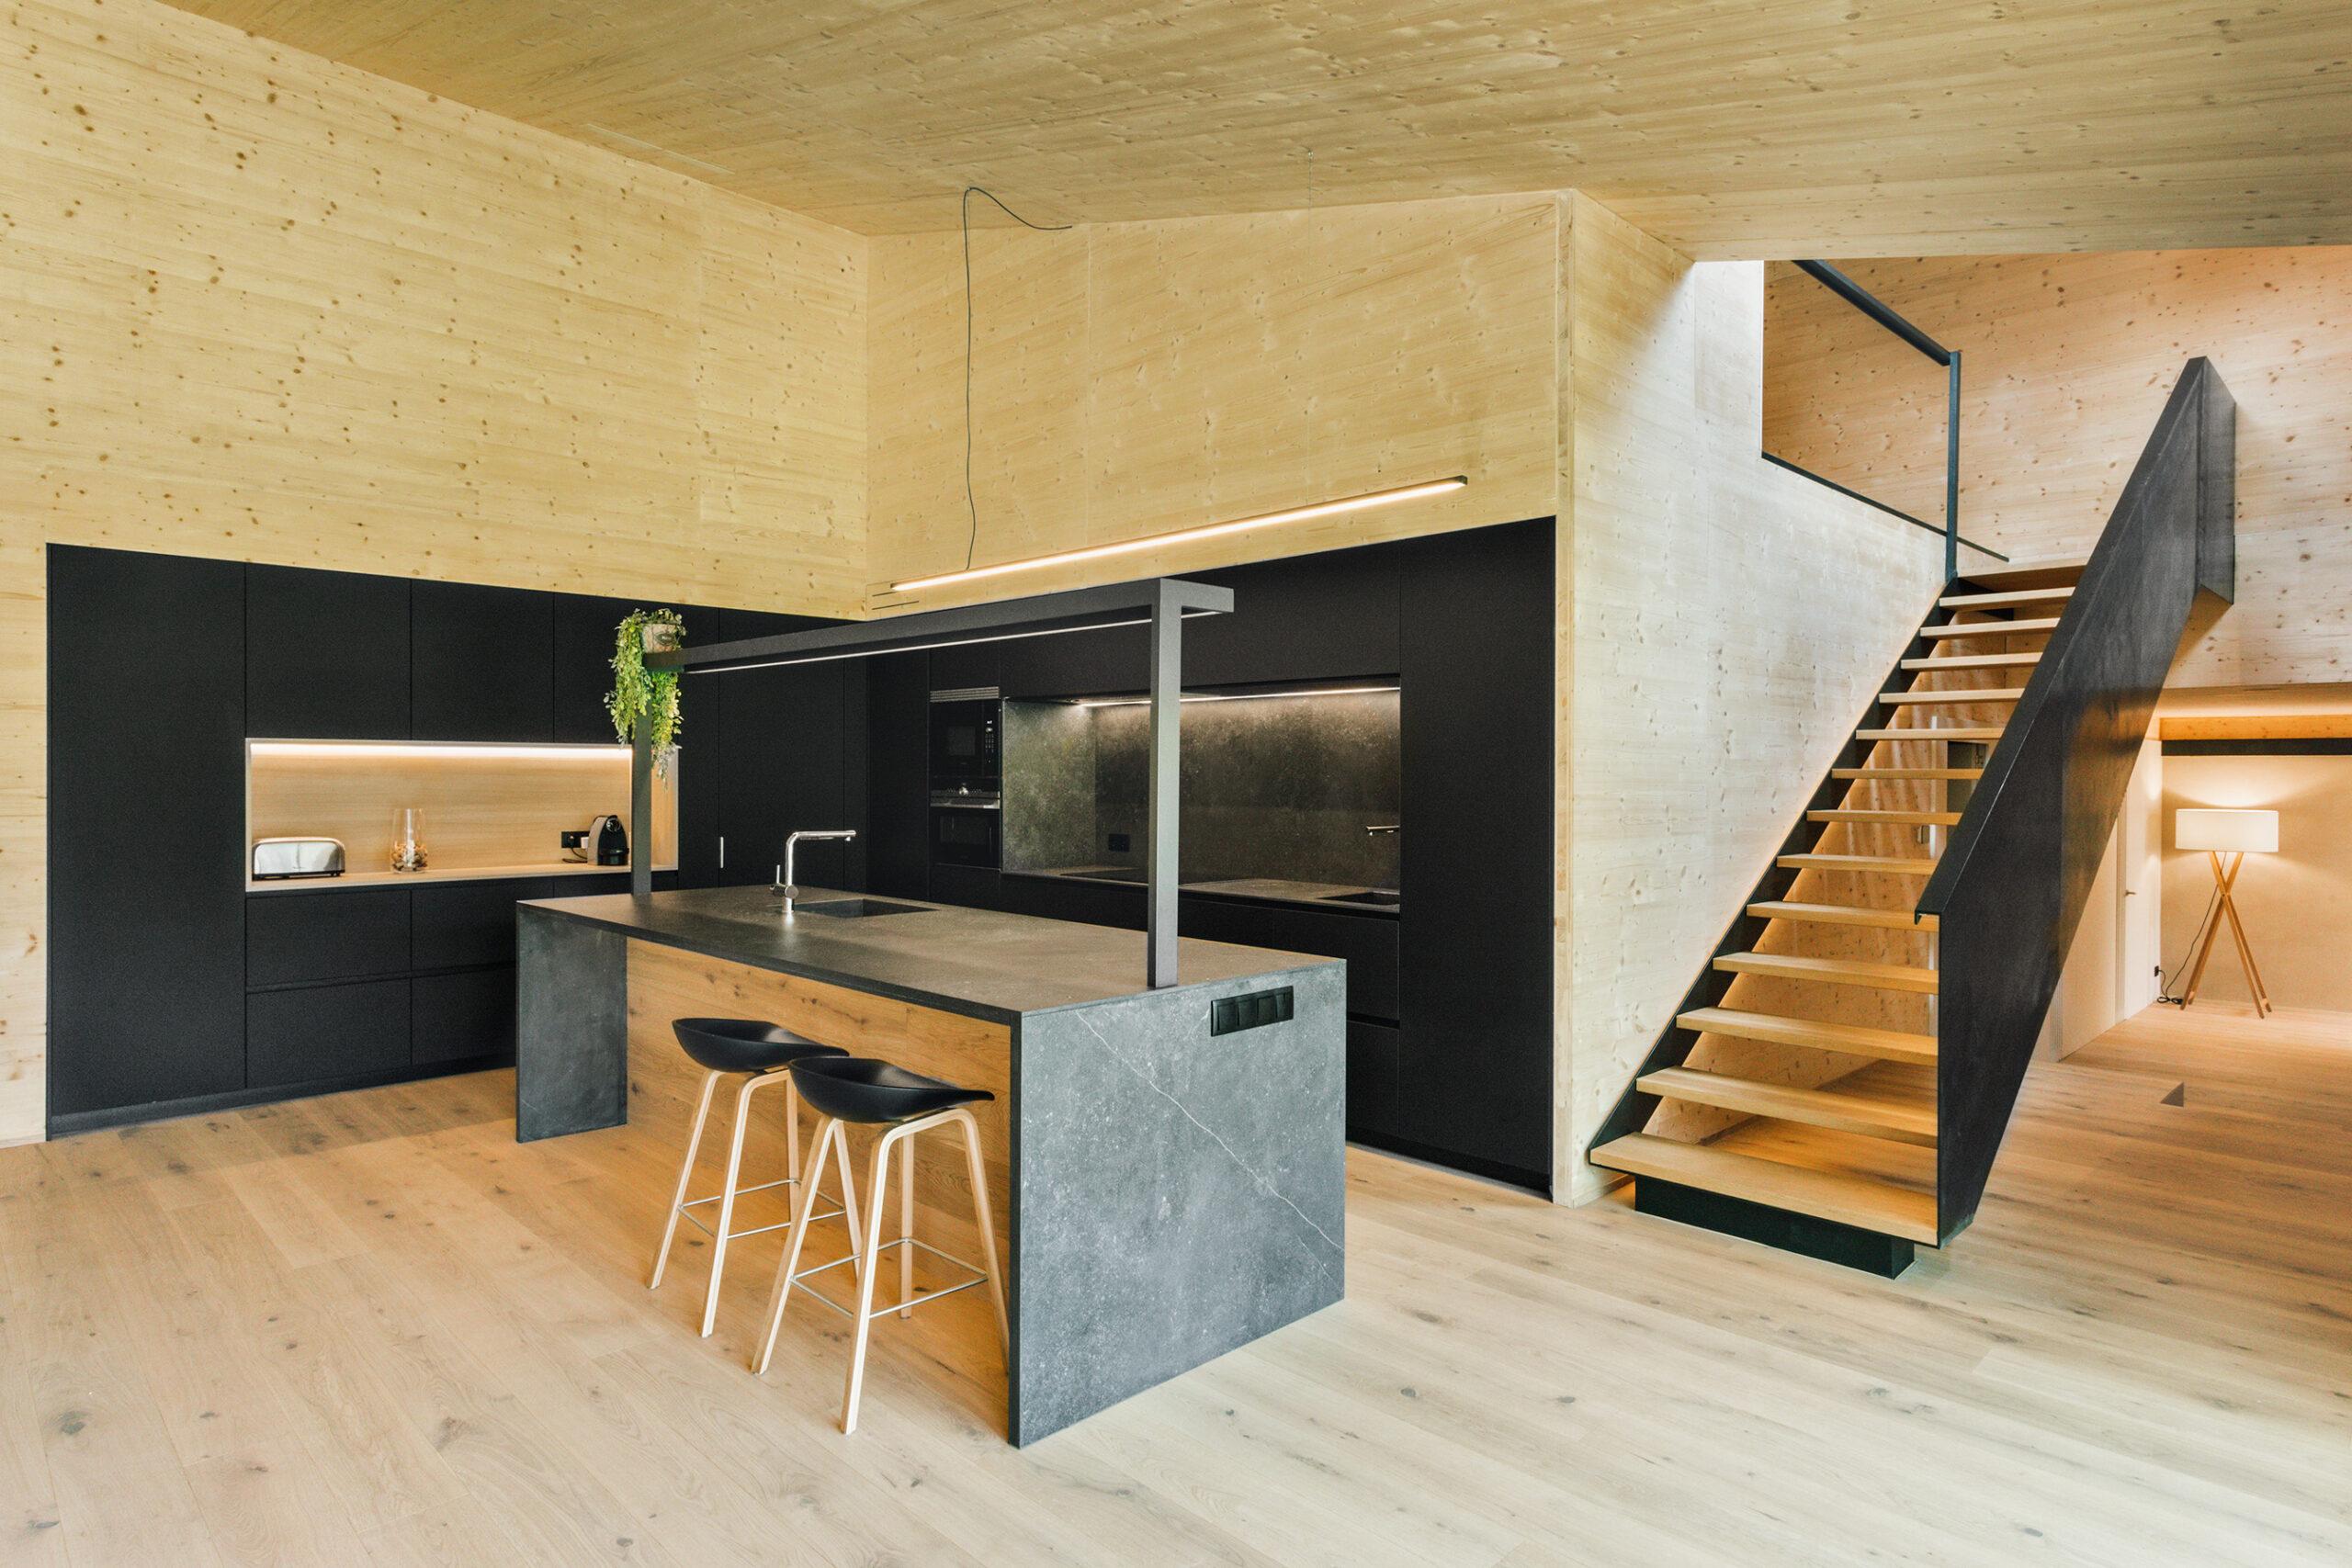 Casa Nefol